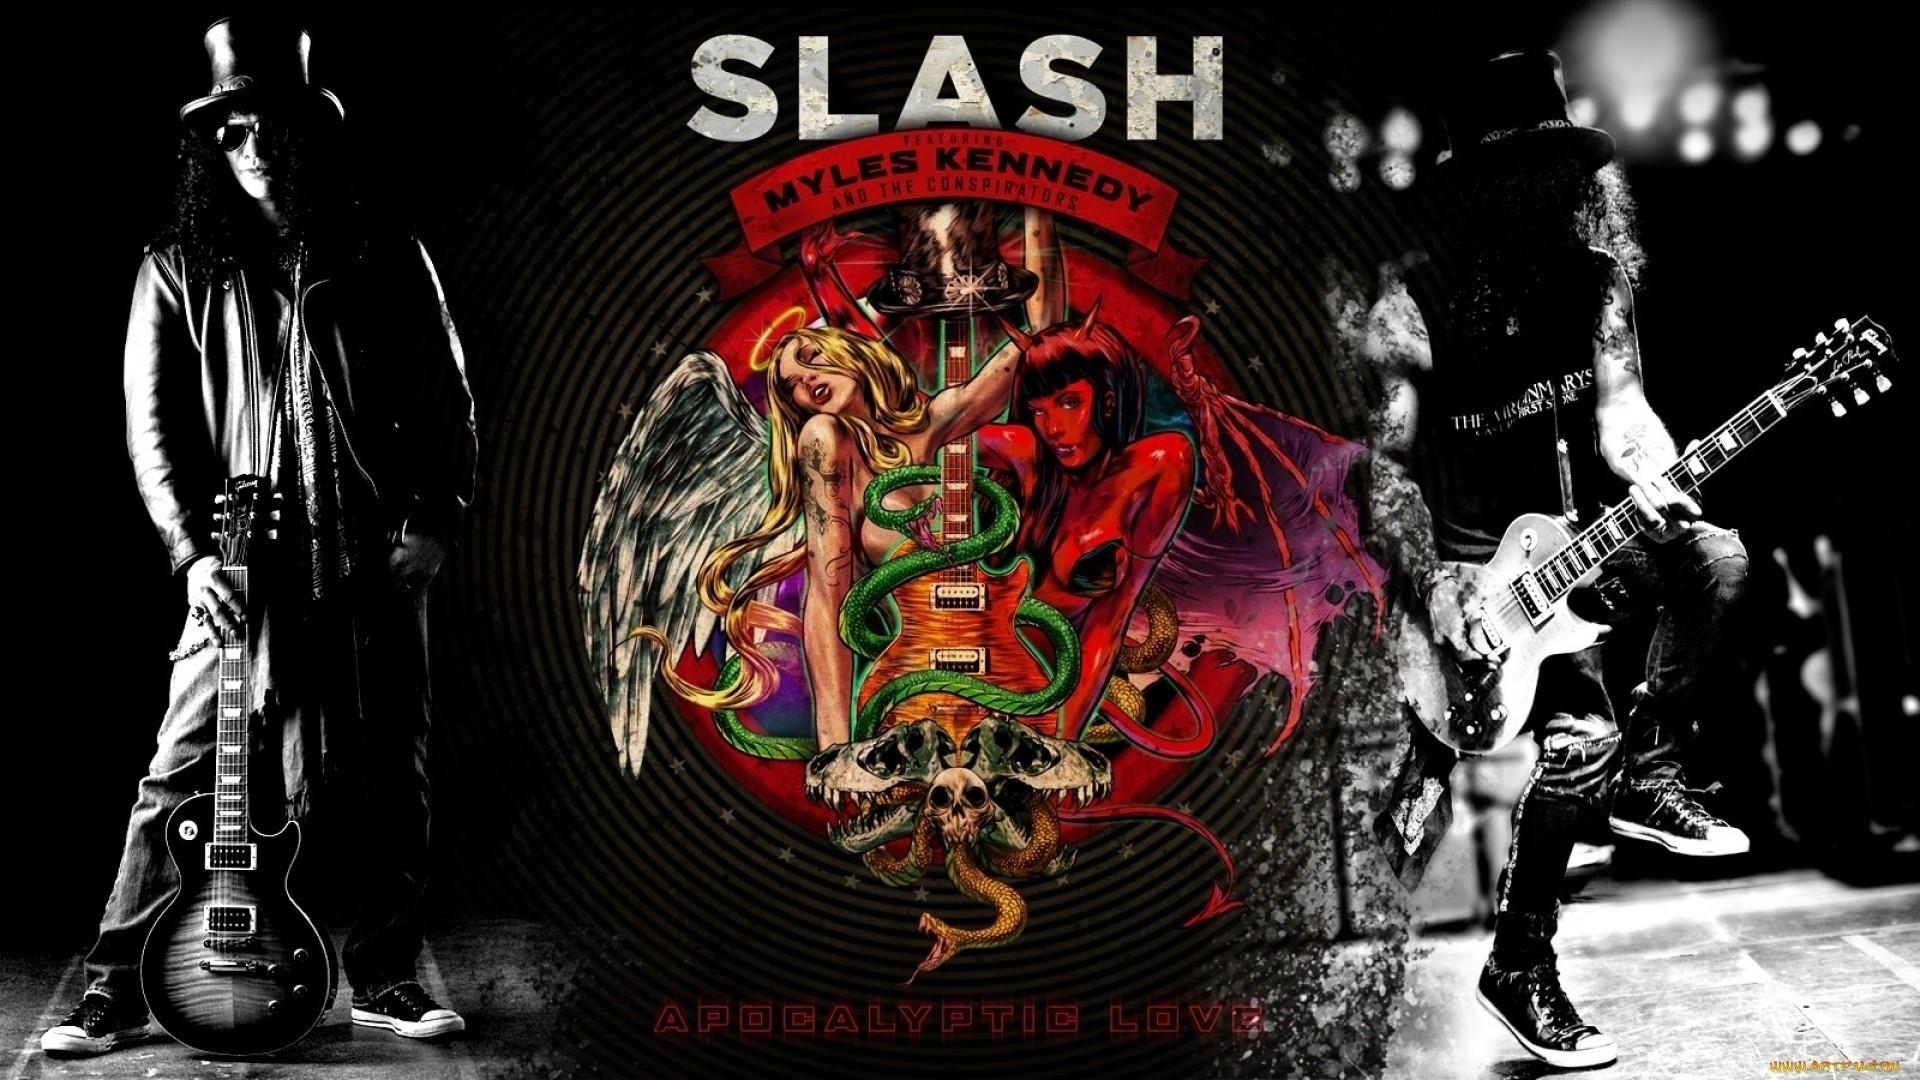 Slash free hd wallpaper